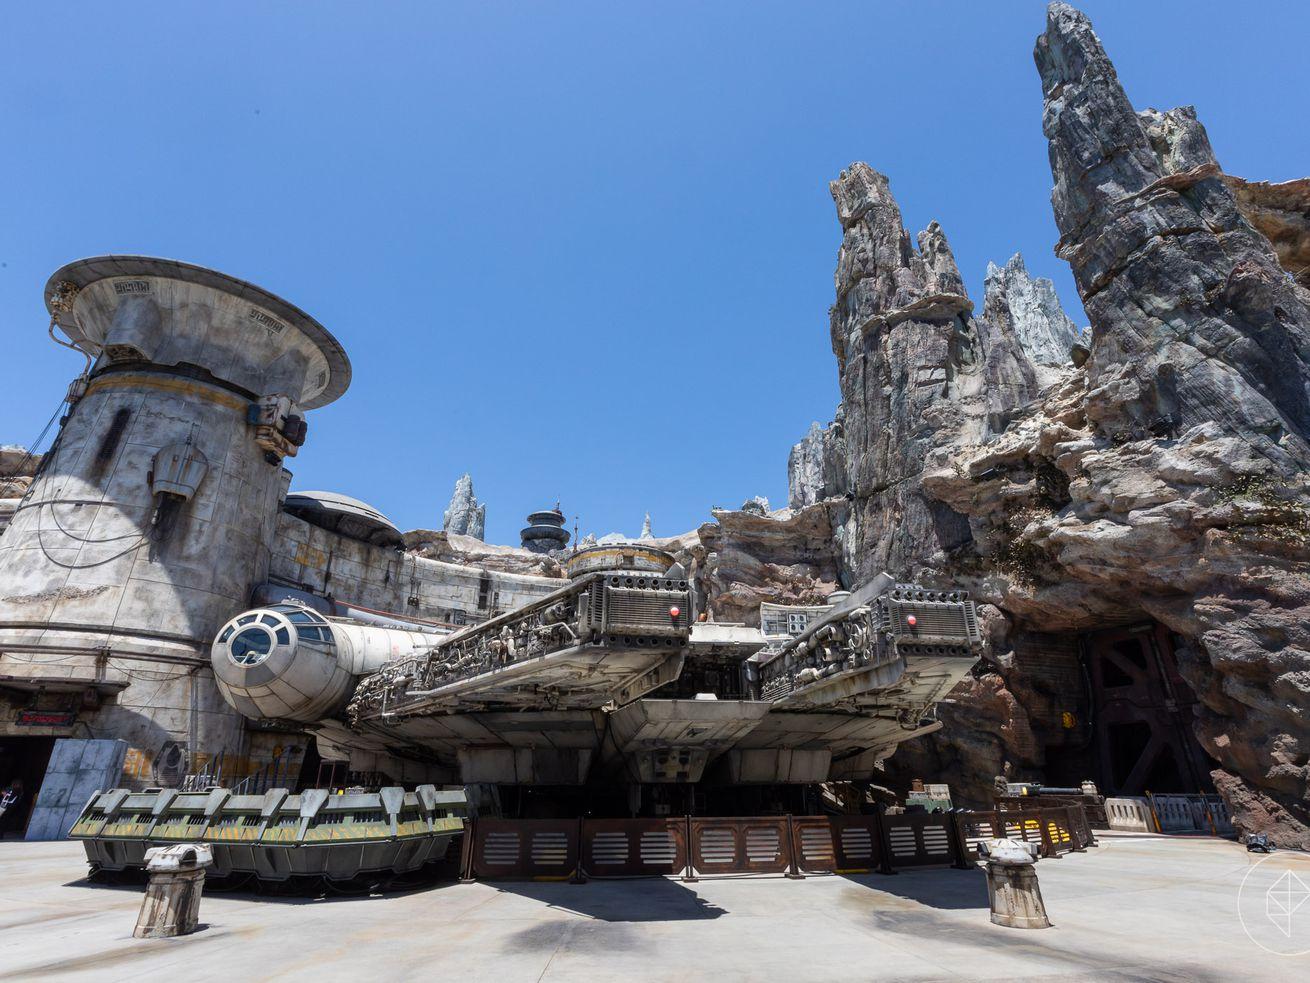 Star Wars land: An inside look at Disneyland?s immersive new world